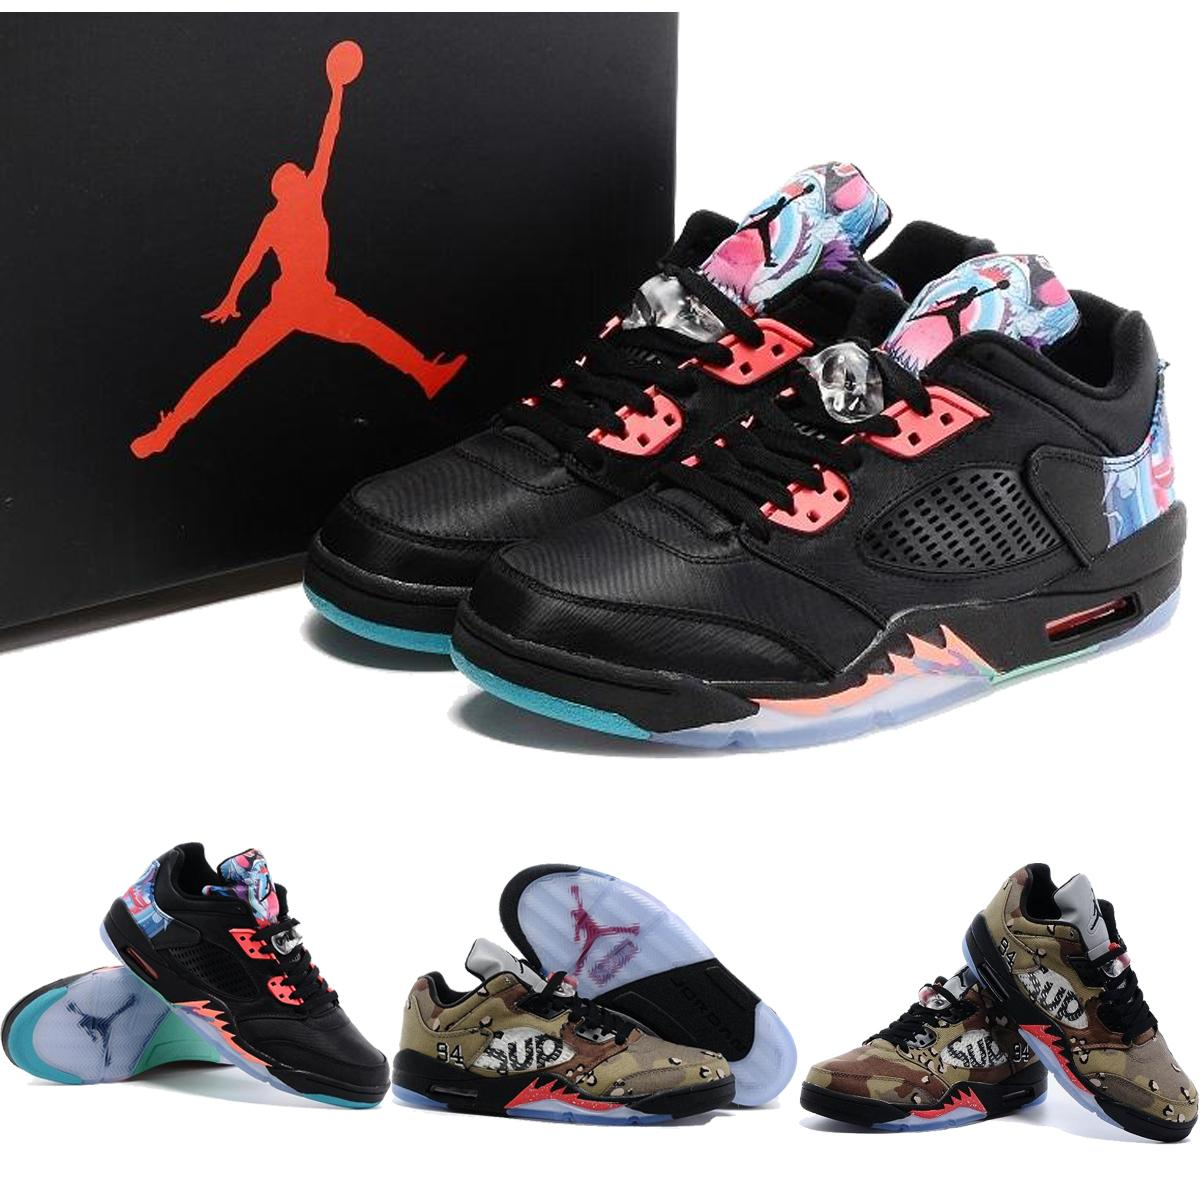 Nike Air Jordan 5 Retro V China Supreme